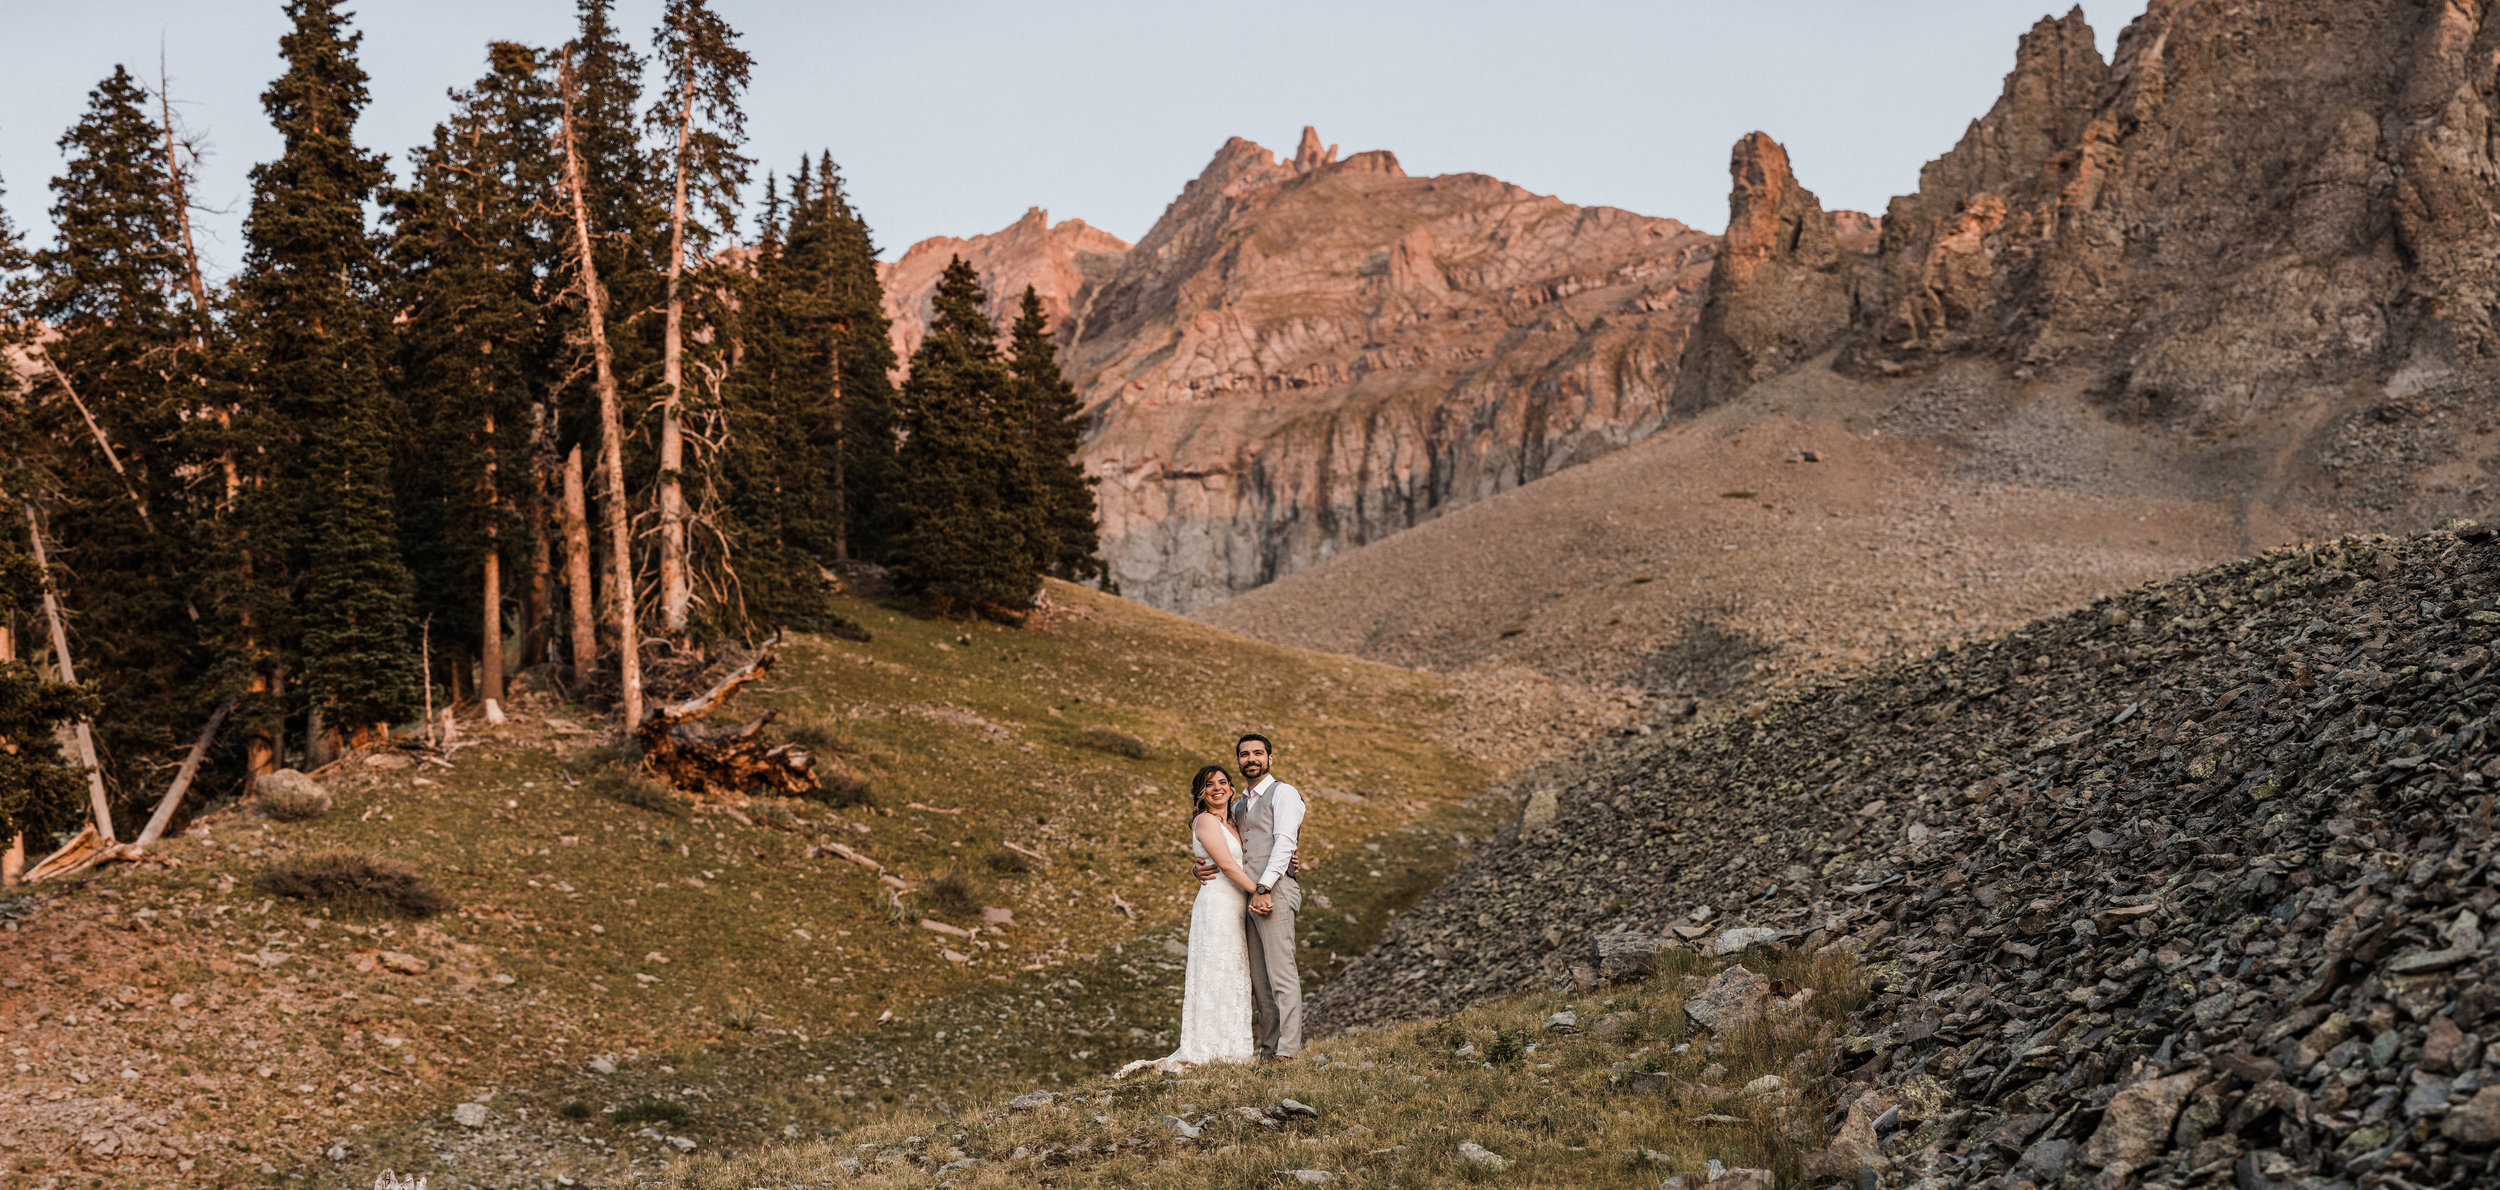 SB-Telluride-WeddingPhotographer-LeahandAshtonPhotography-ws.jpg